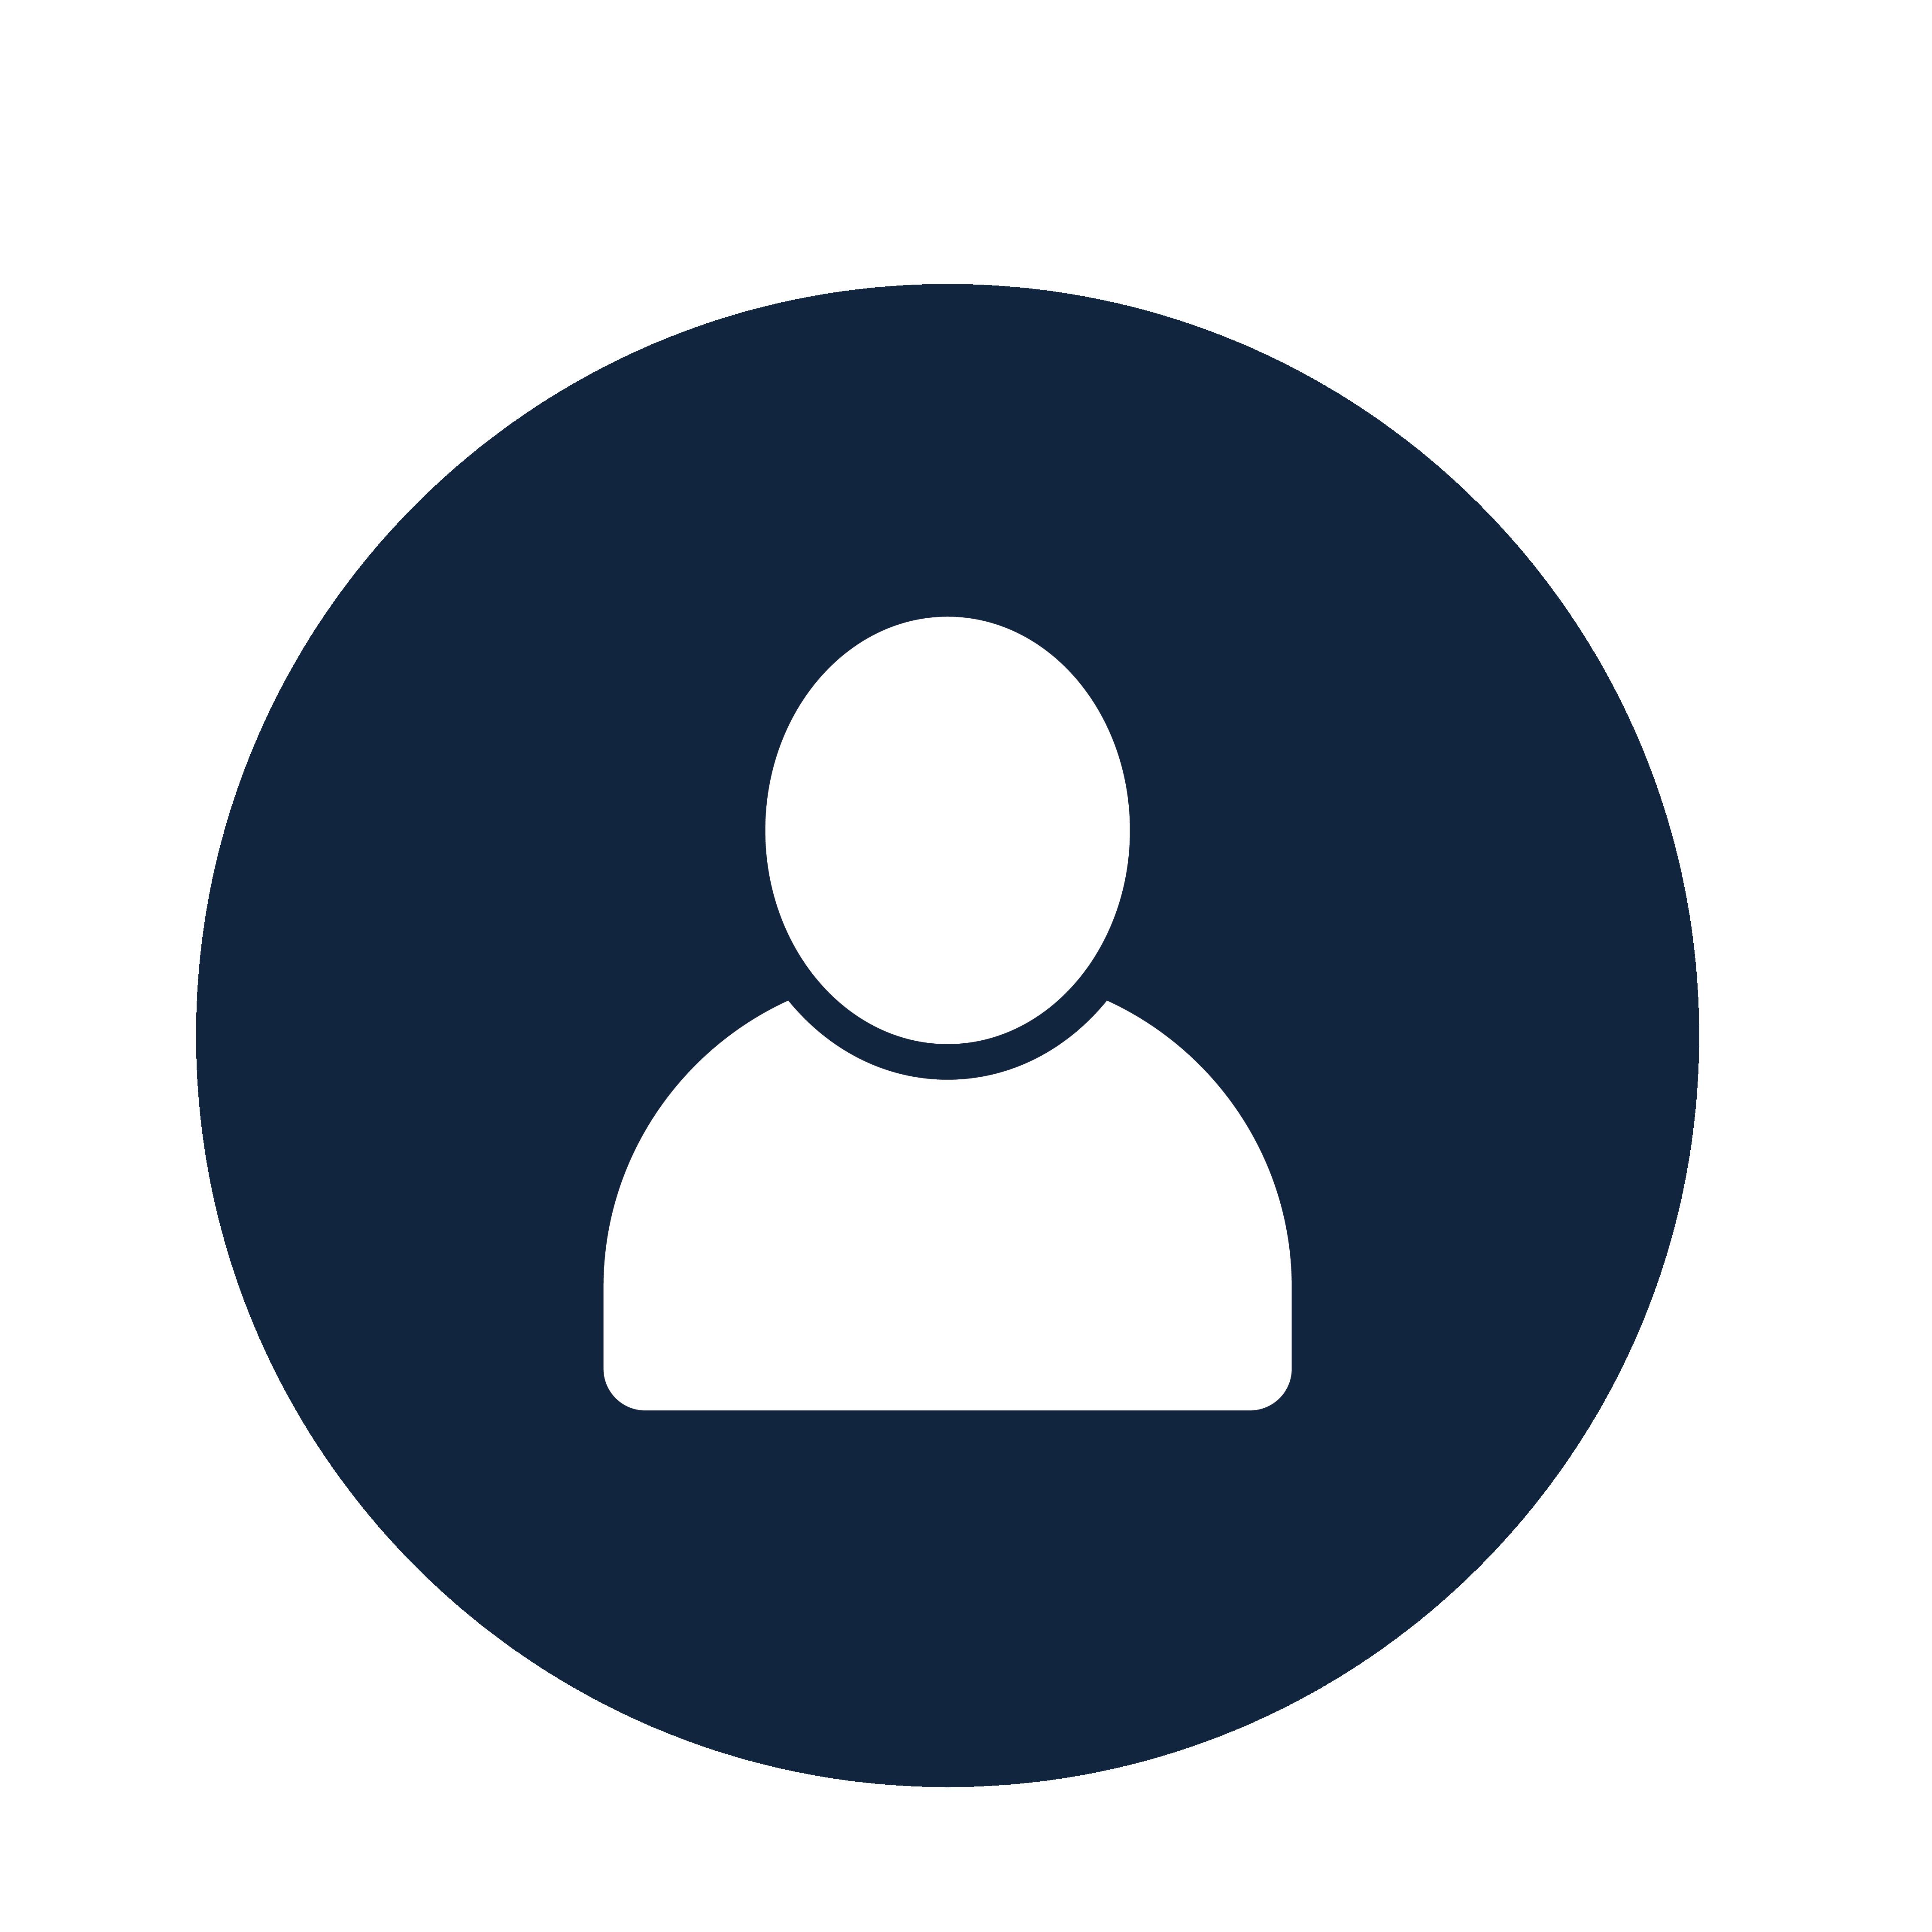 icon of users representing Young alumni council has 25 total members. Black Alumni Council has 10 members